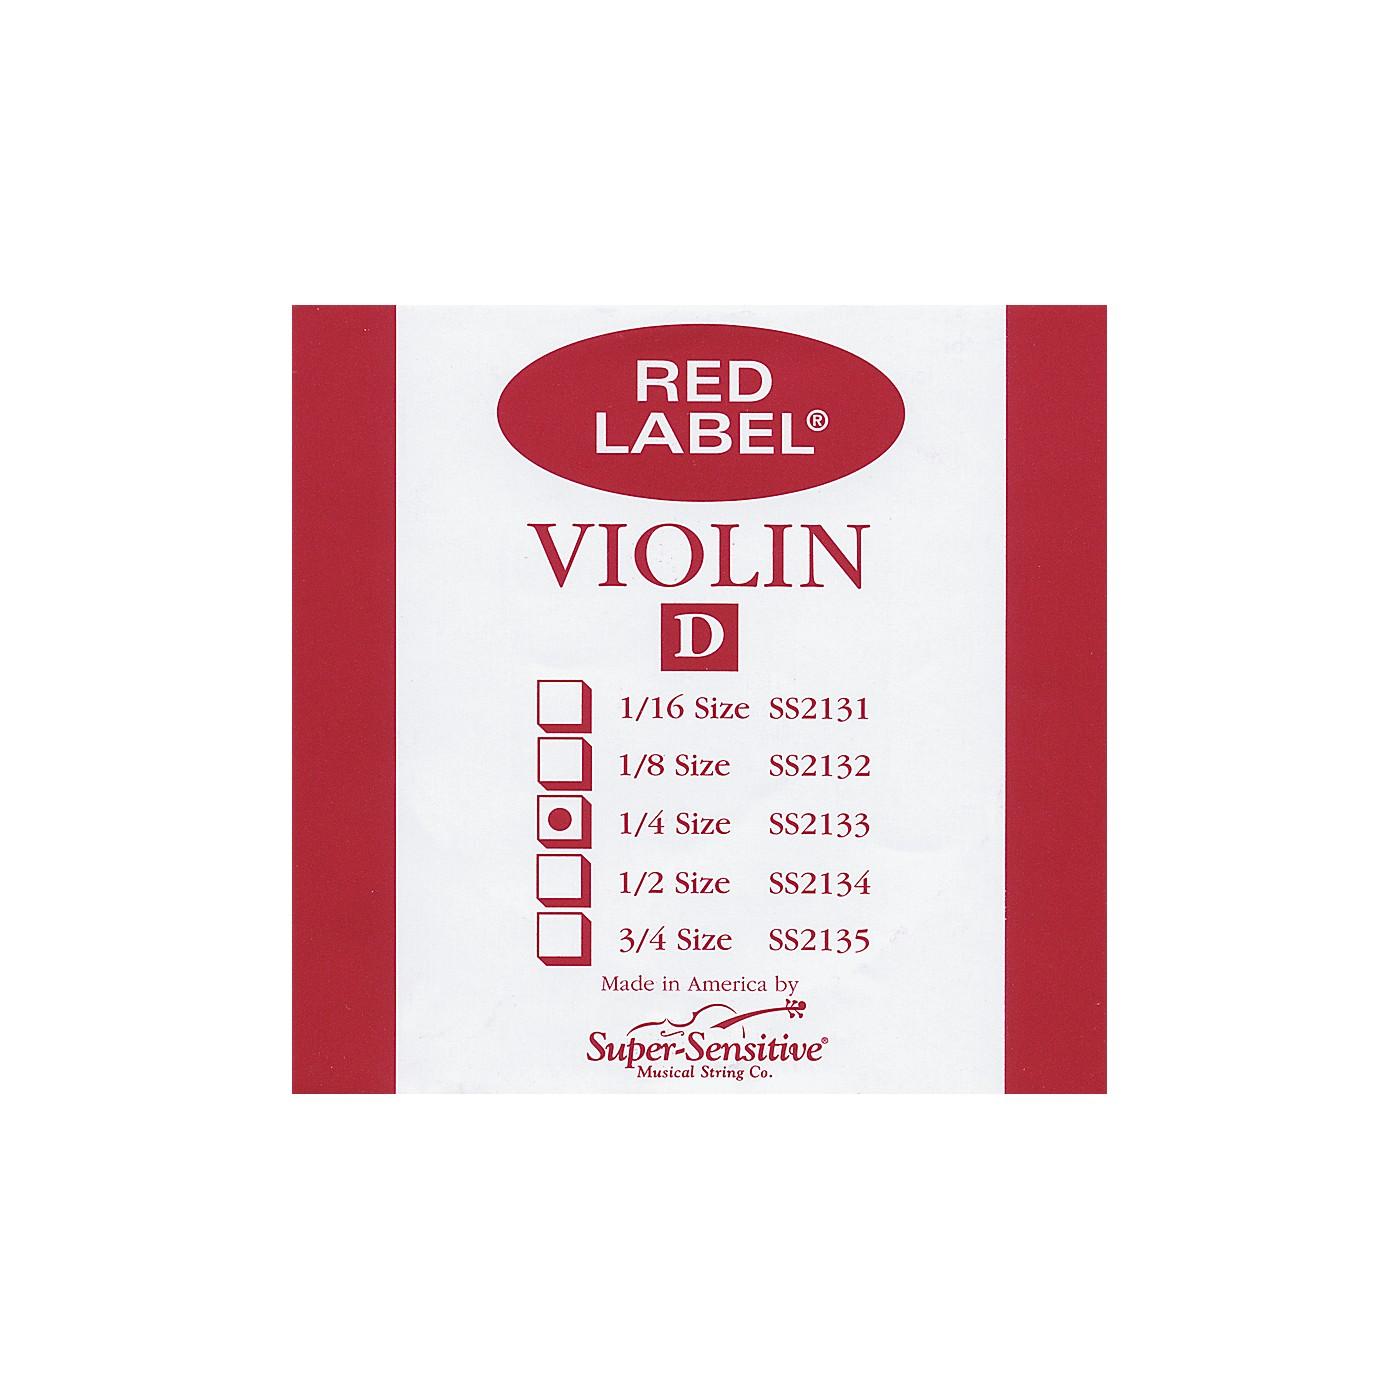 Super Sensitive Red Label Violin D String thumbnail